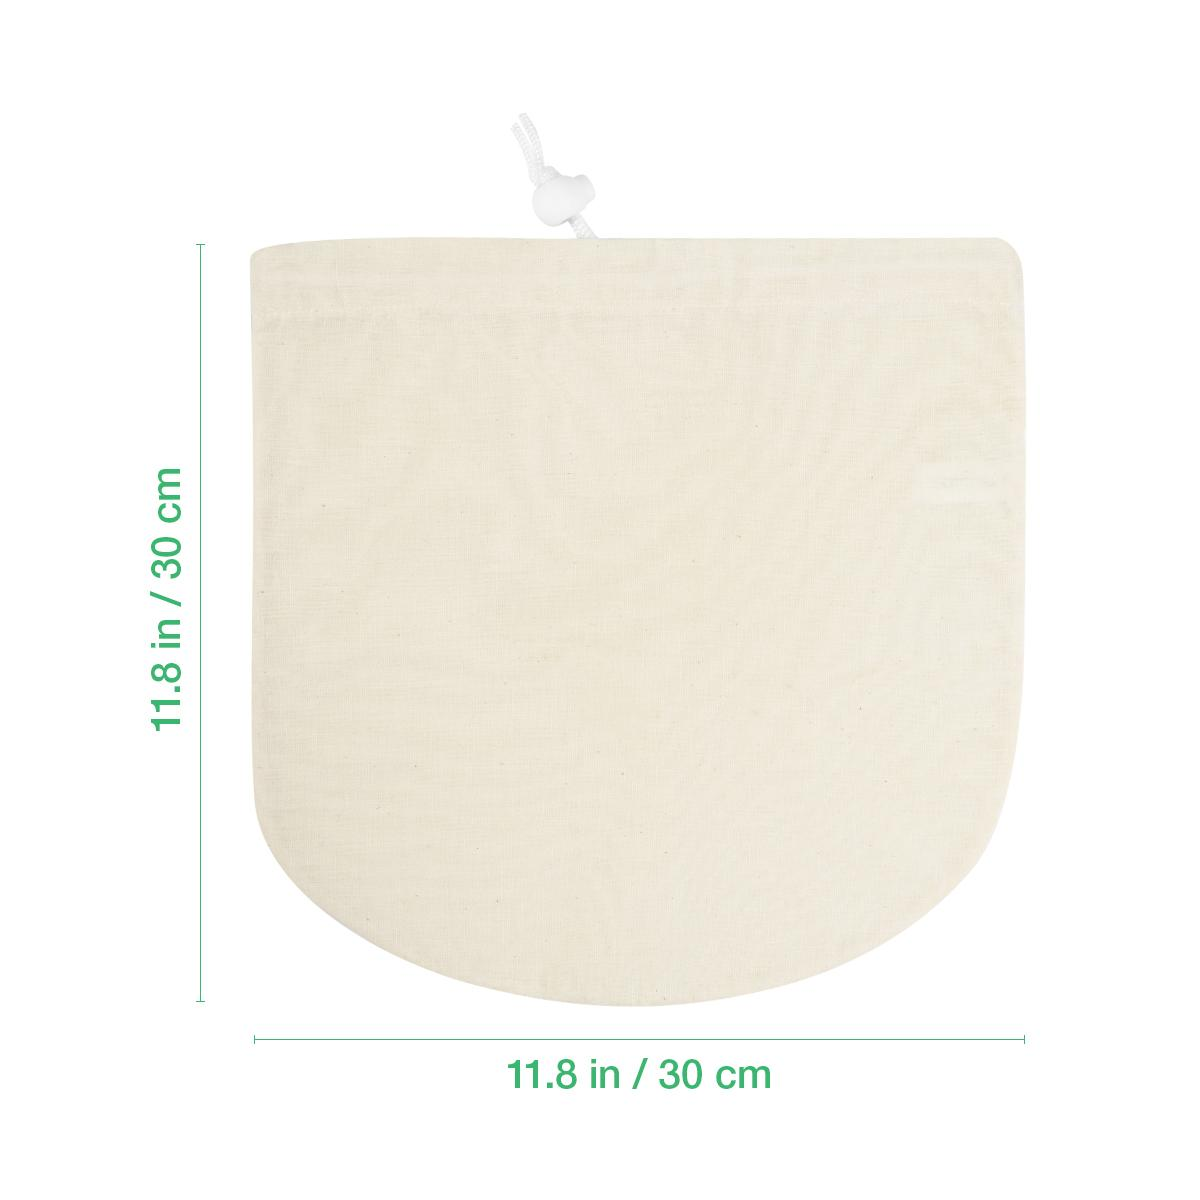 La bolsa de filtro de nylon del tamiz de la comida de la malla fina para el jugo frío del café de la cerveza de la tuerca casera